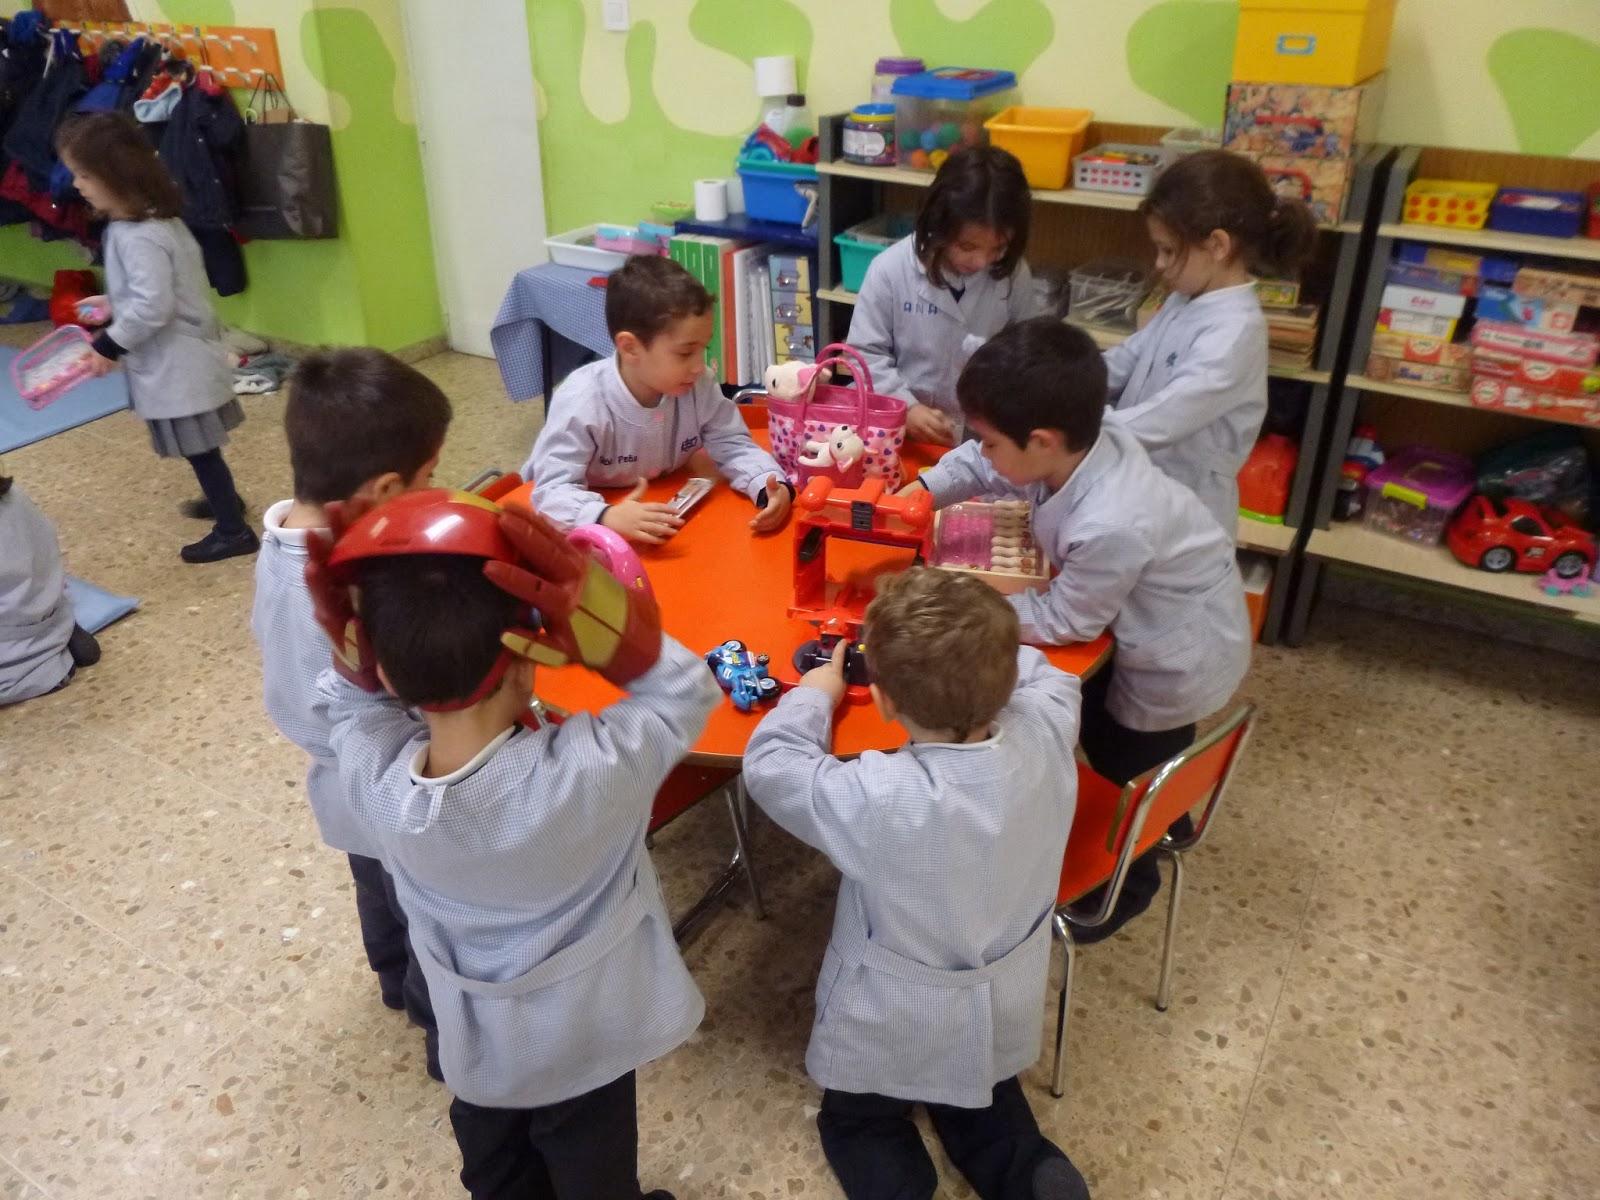 Agustinas Valladolid - Infantil - Reyes Magos 1